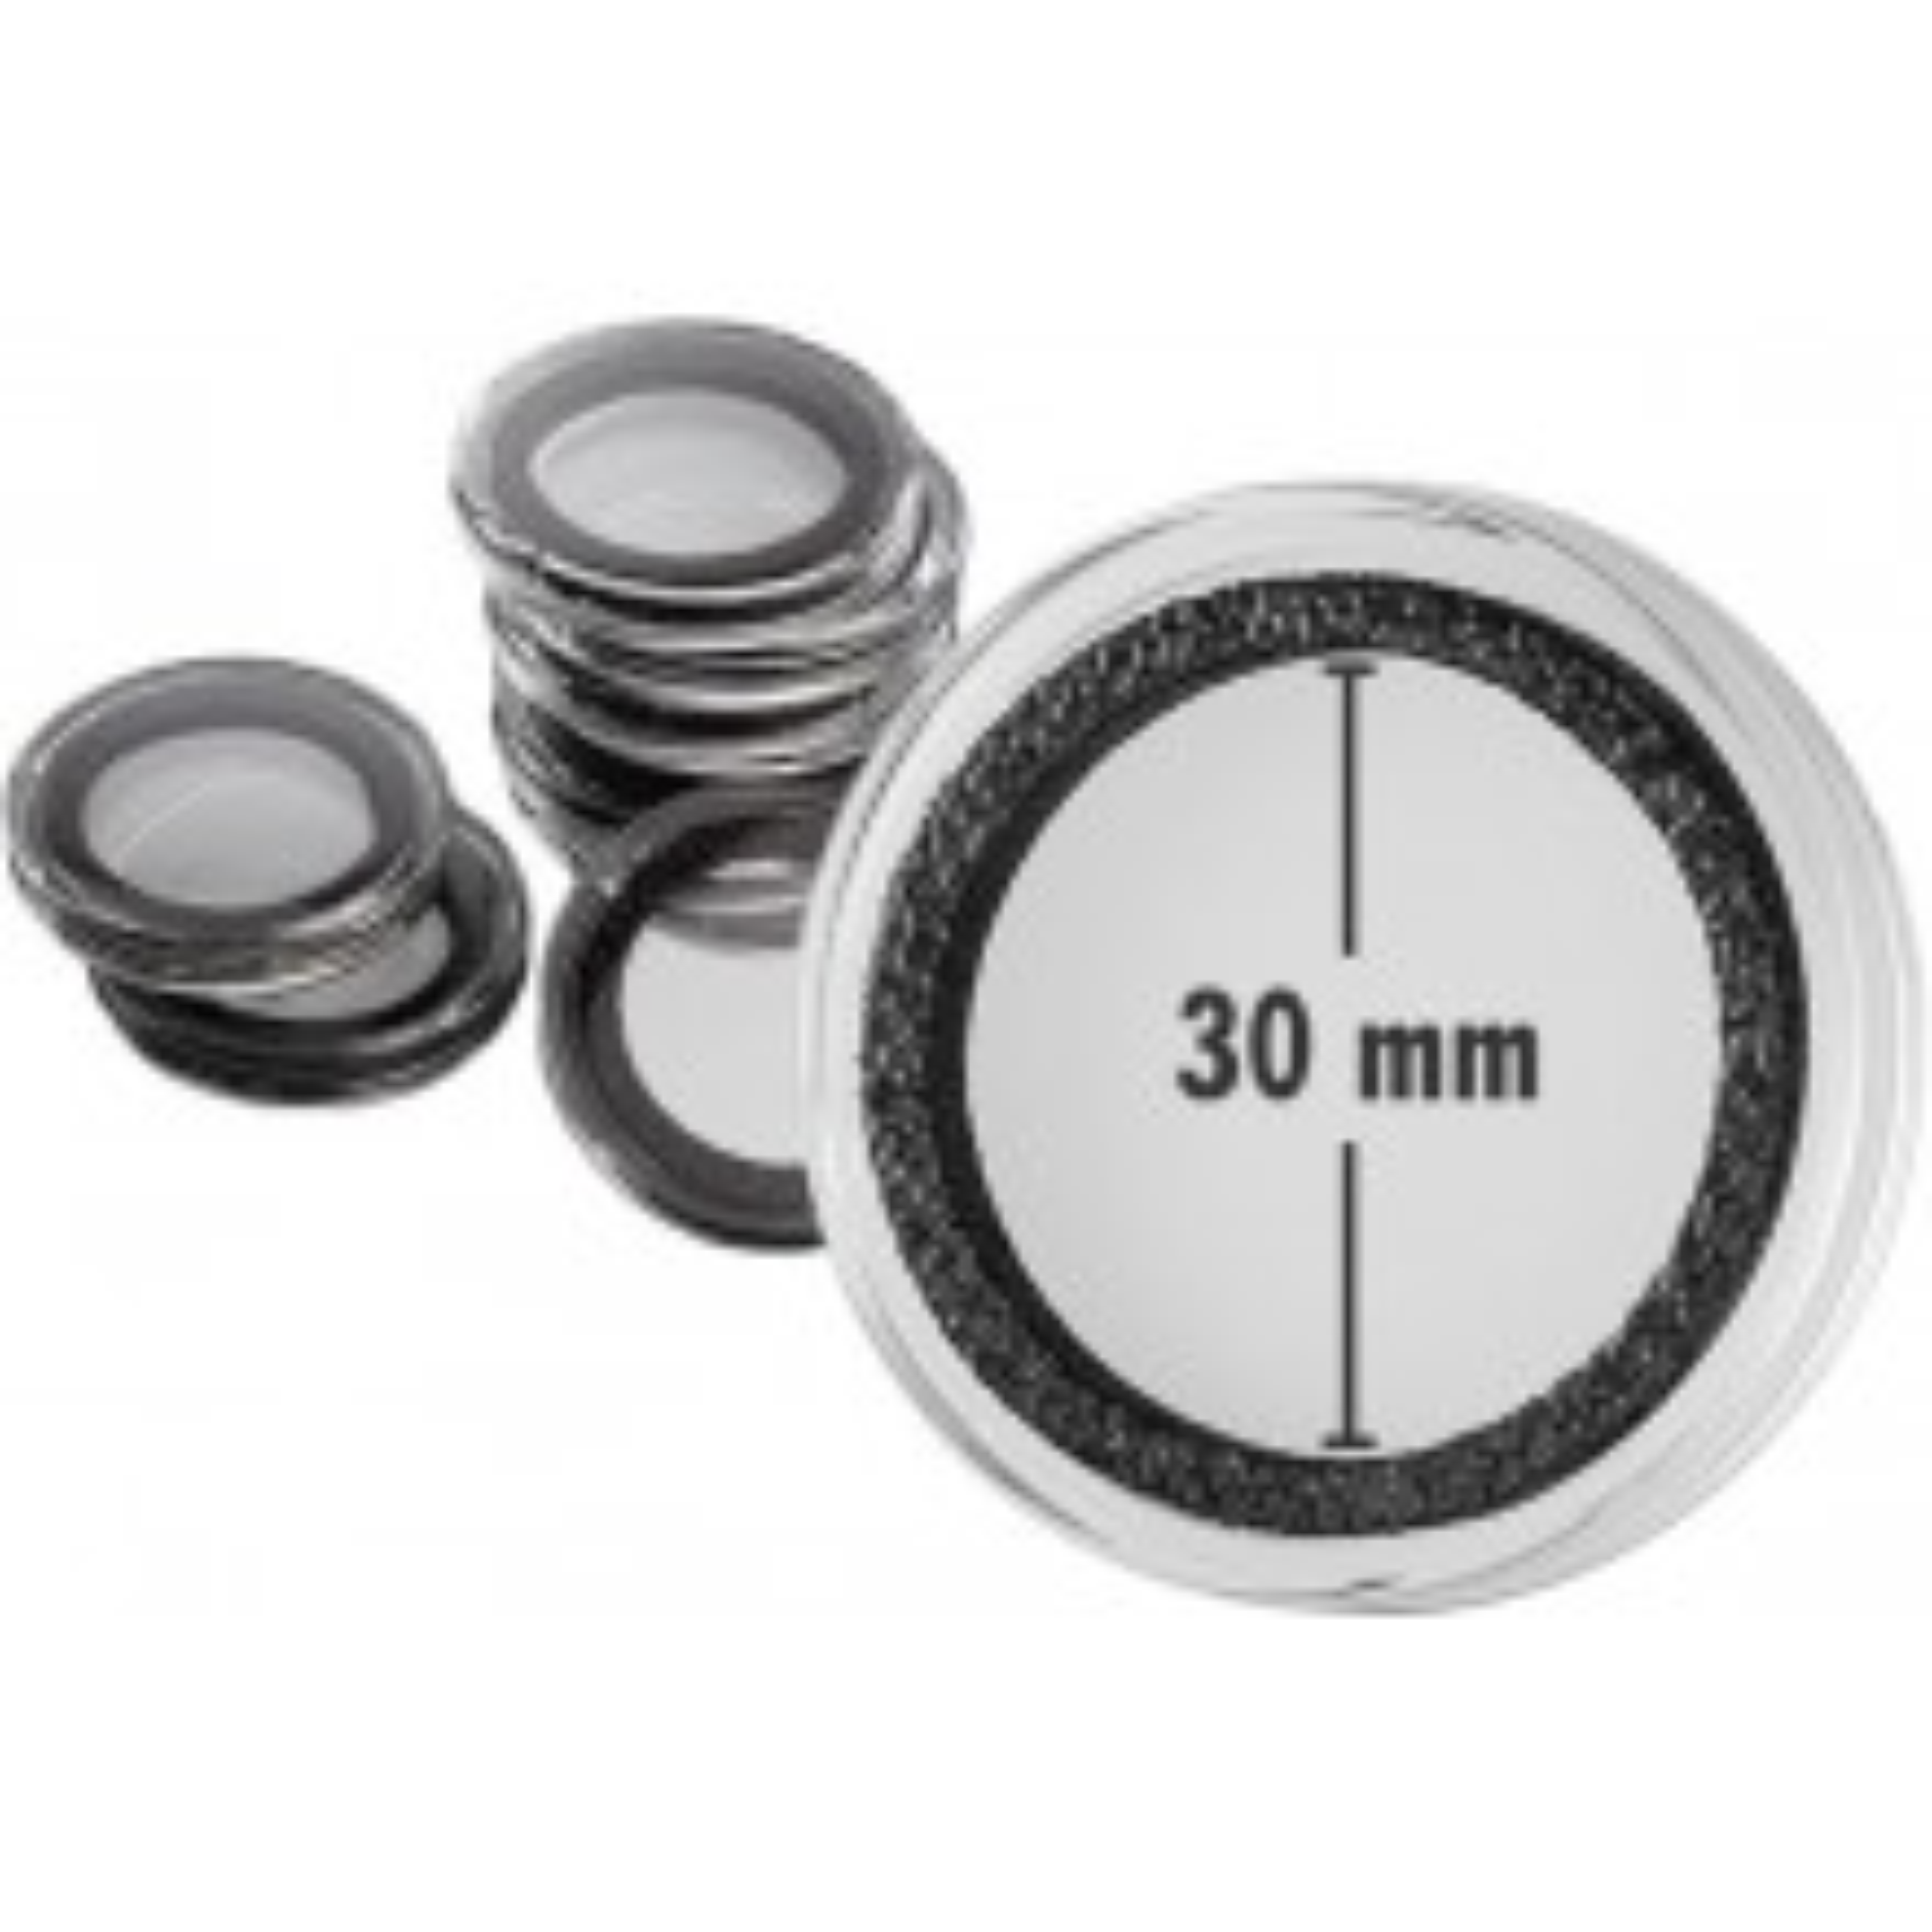 Doos van 10 stuks muntcapsule 30 mm Intercept